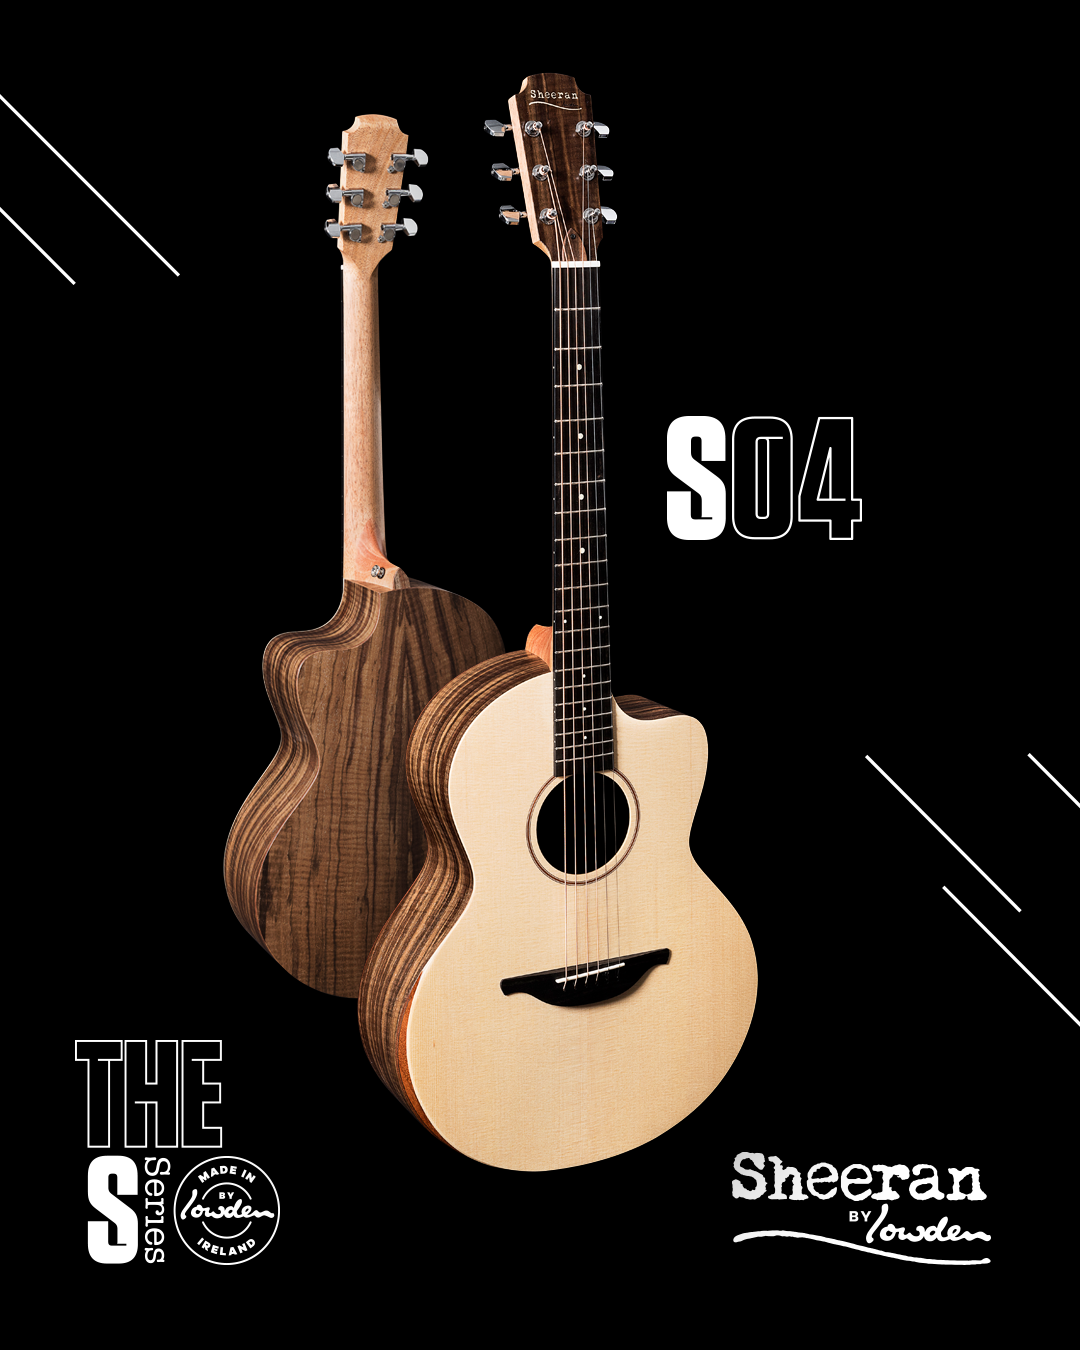 Sheeran S04 PRE ORDER